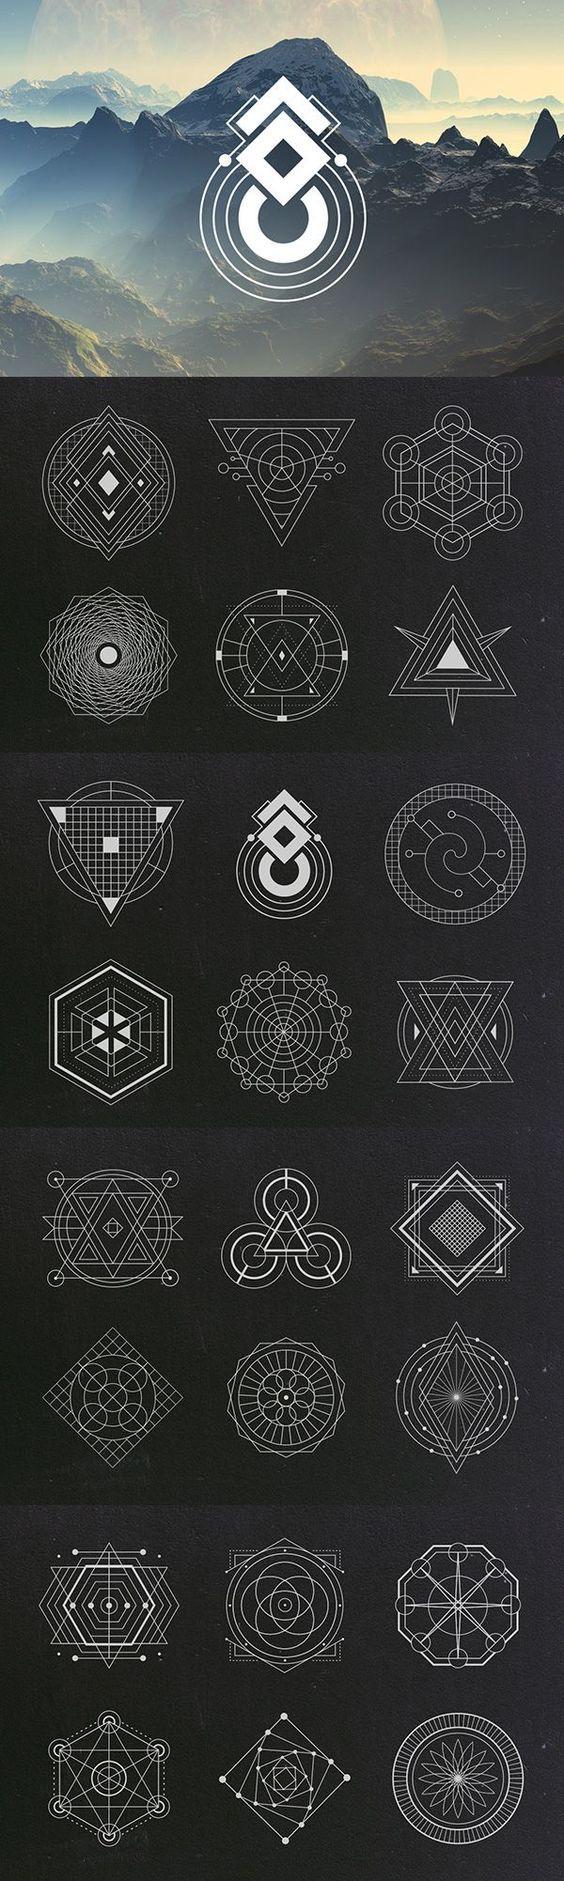 Sacred Geometry Vectors   Graphic Design Elements   Geometric Vector Clipart Images   Blog Graphics   Web Design   Branding Niche   Blogging   Business   Art: